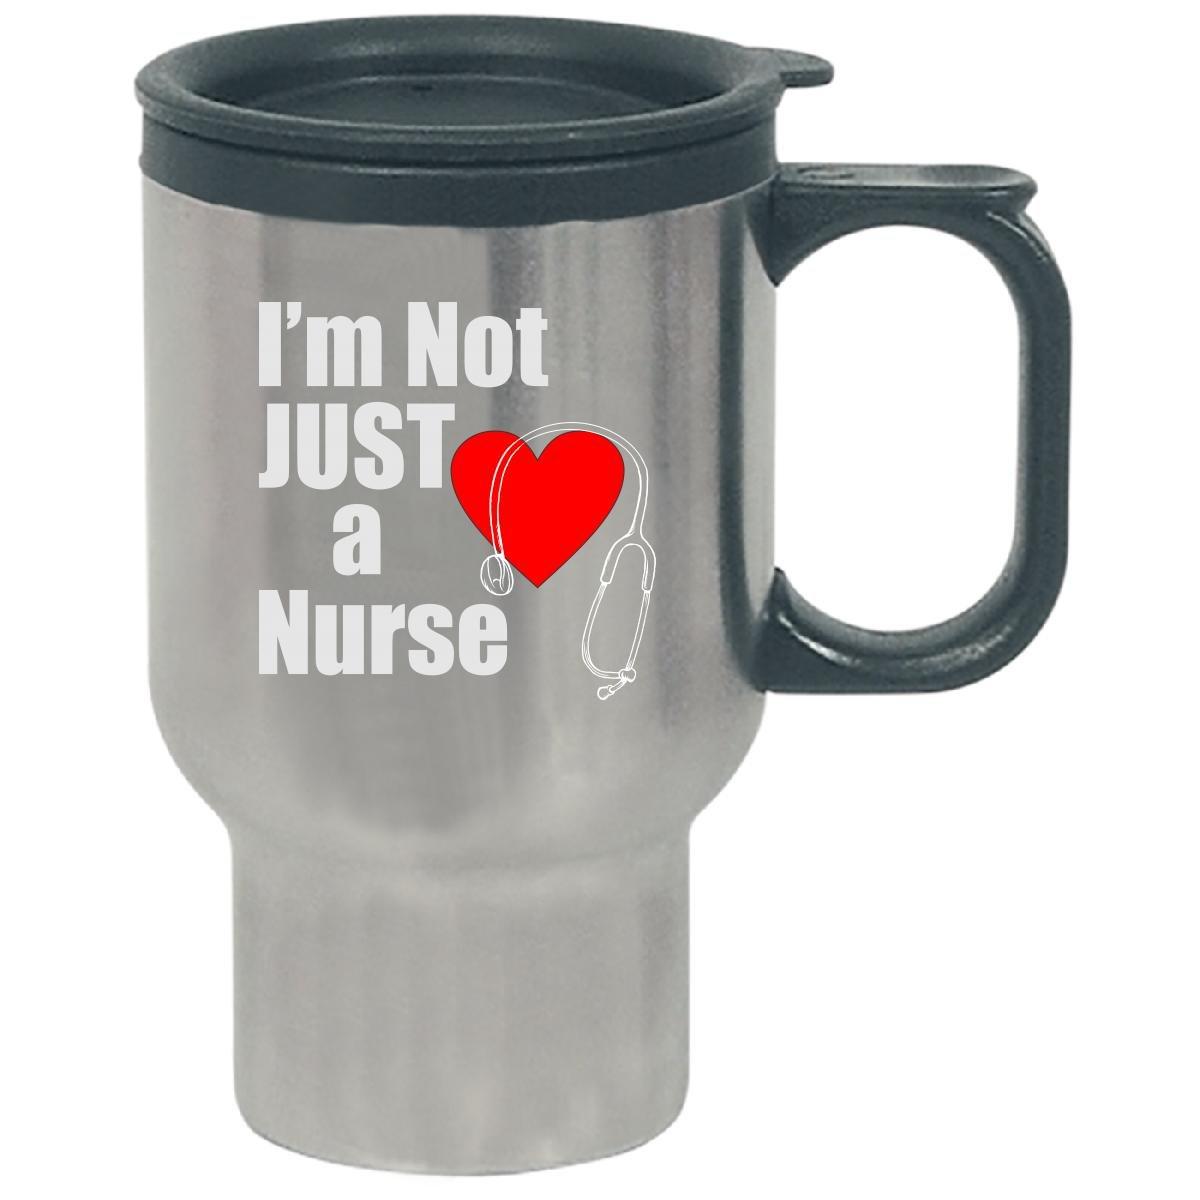 Im Not Just A Nurse With Stethoscope Love Heart - Travel Mug